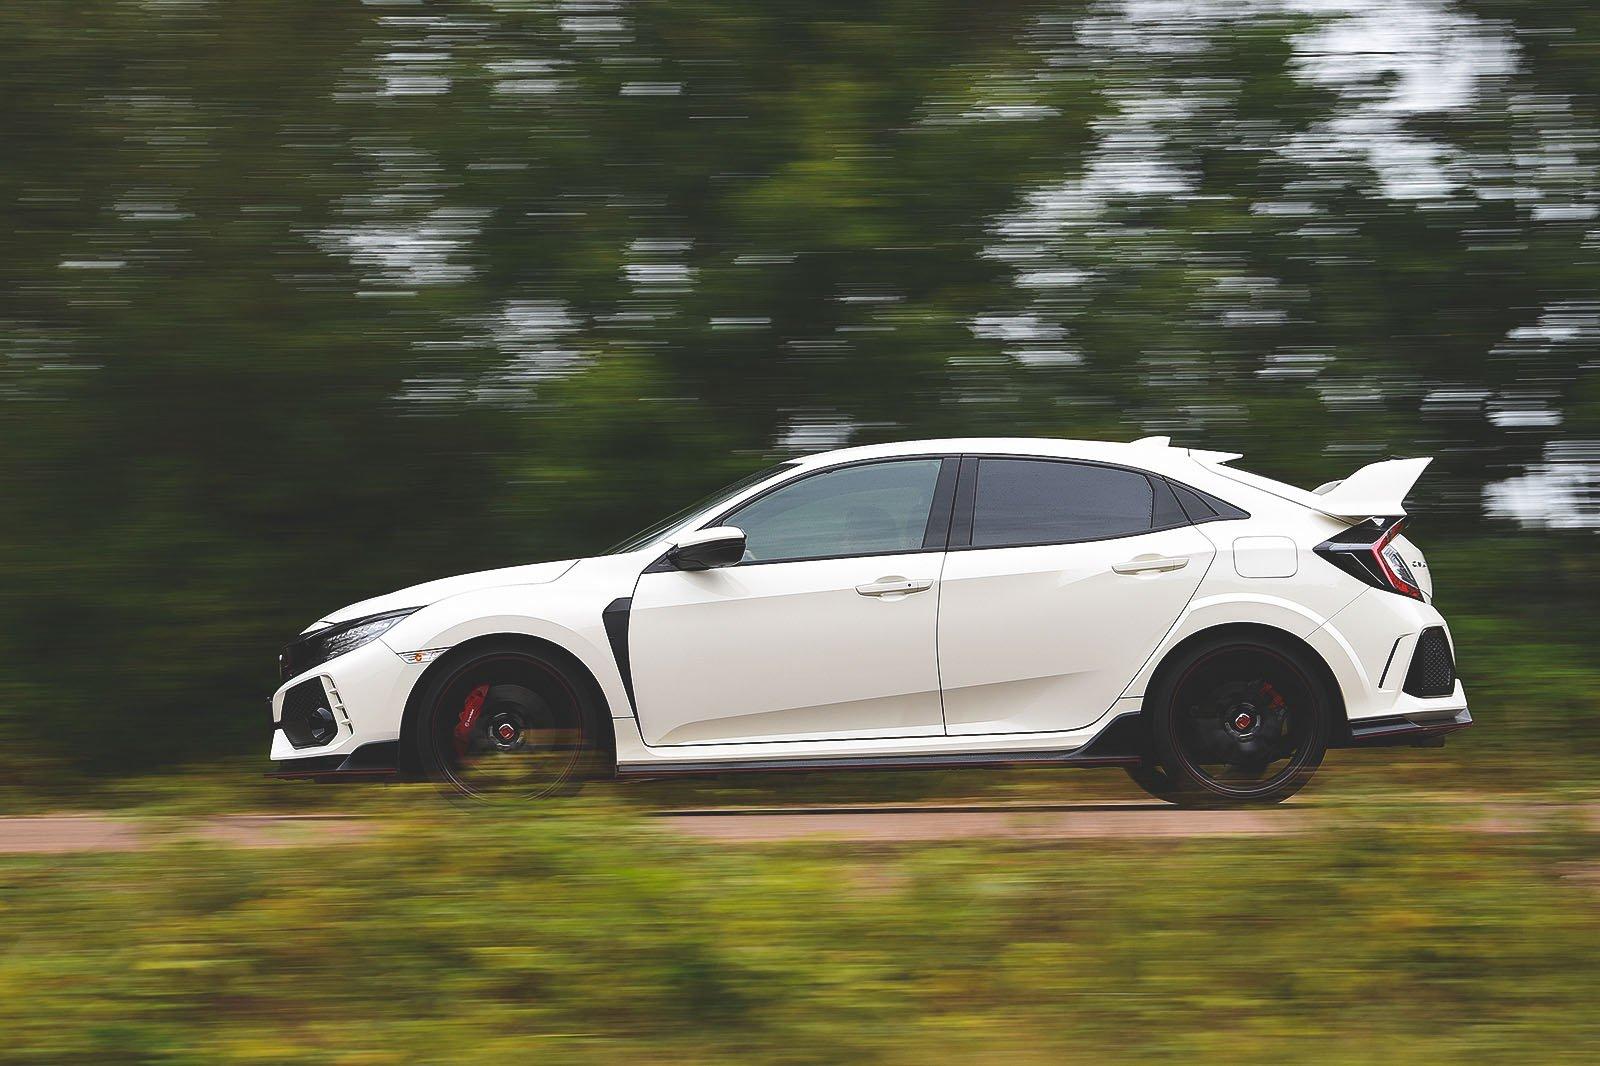 Honda Civic Type R 2019 left side panning shot